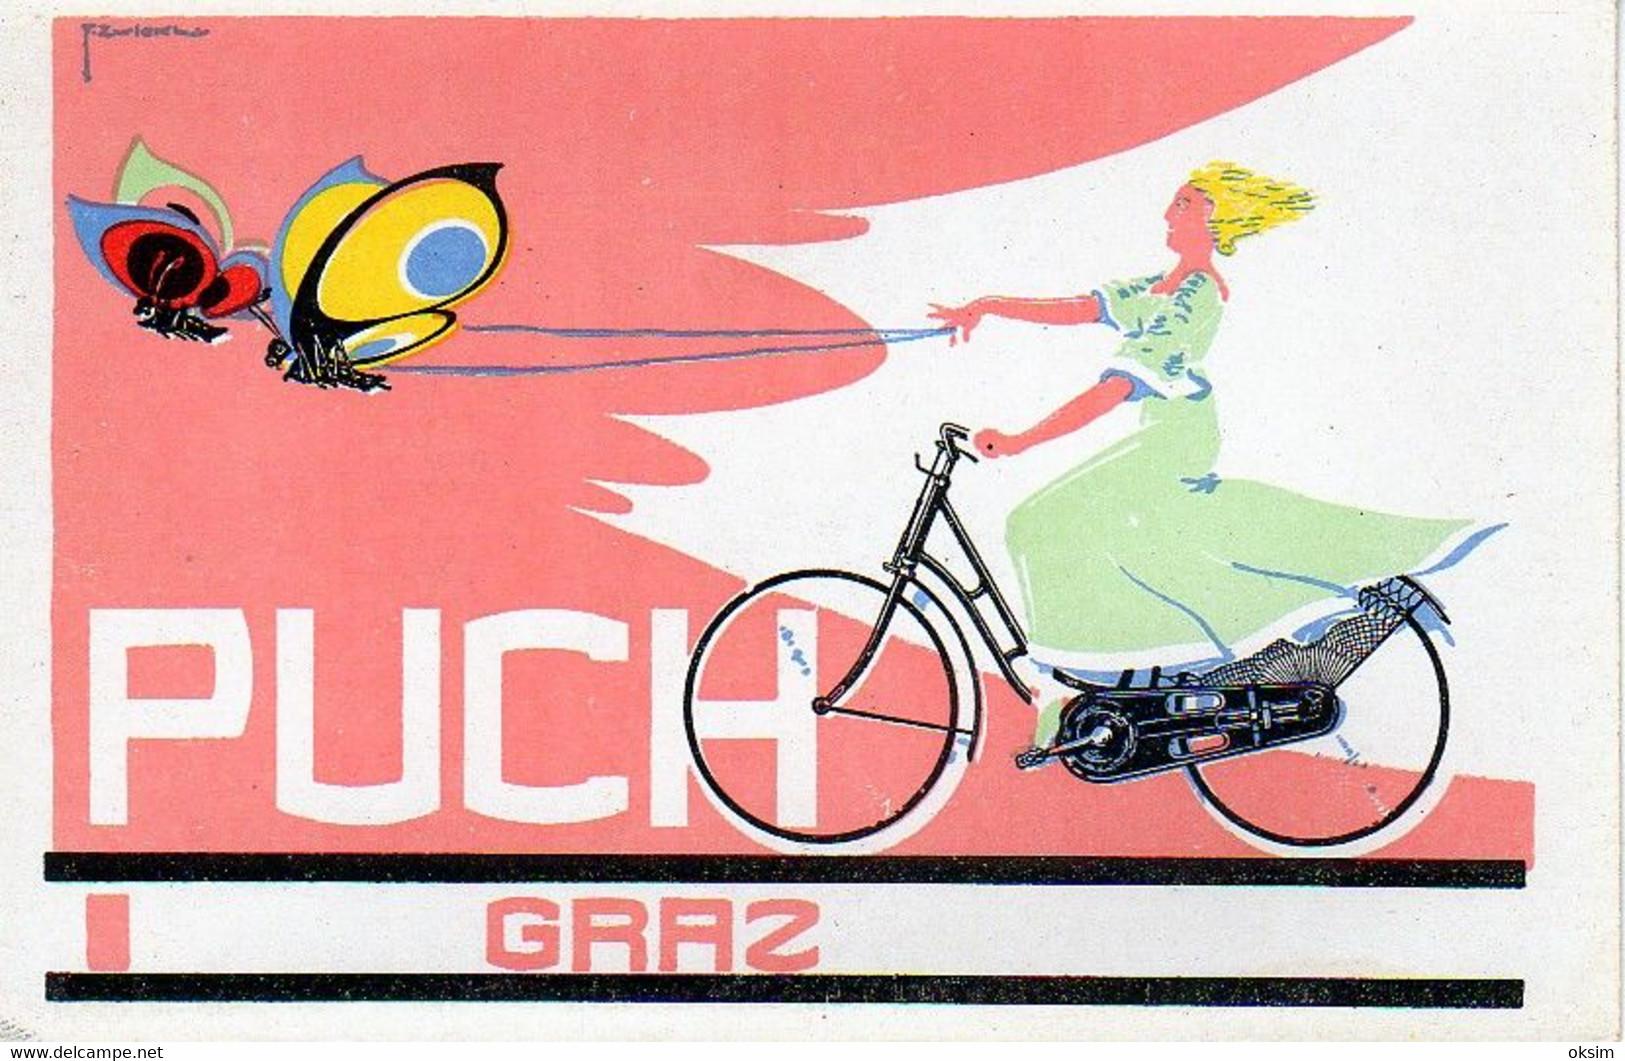 PUCH, F. ZWICKL, PUCHWERKE A. G., GRAZ, WIEN, BICYCLE, FAHRRAD - Advertising